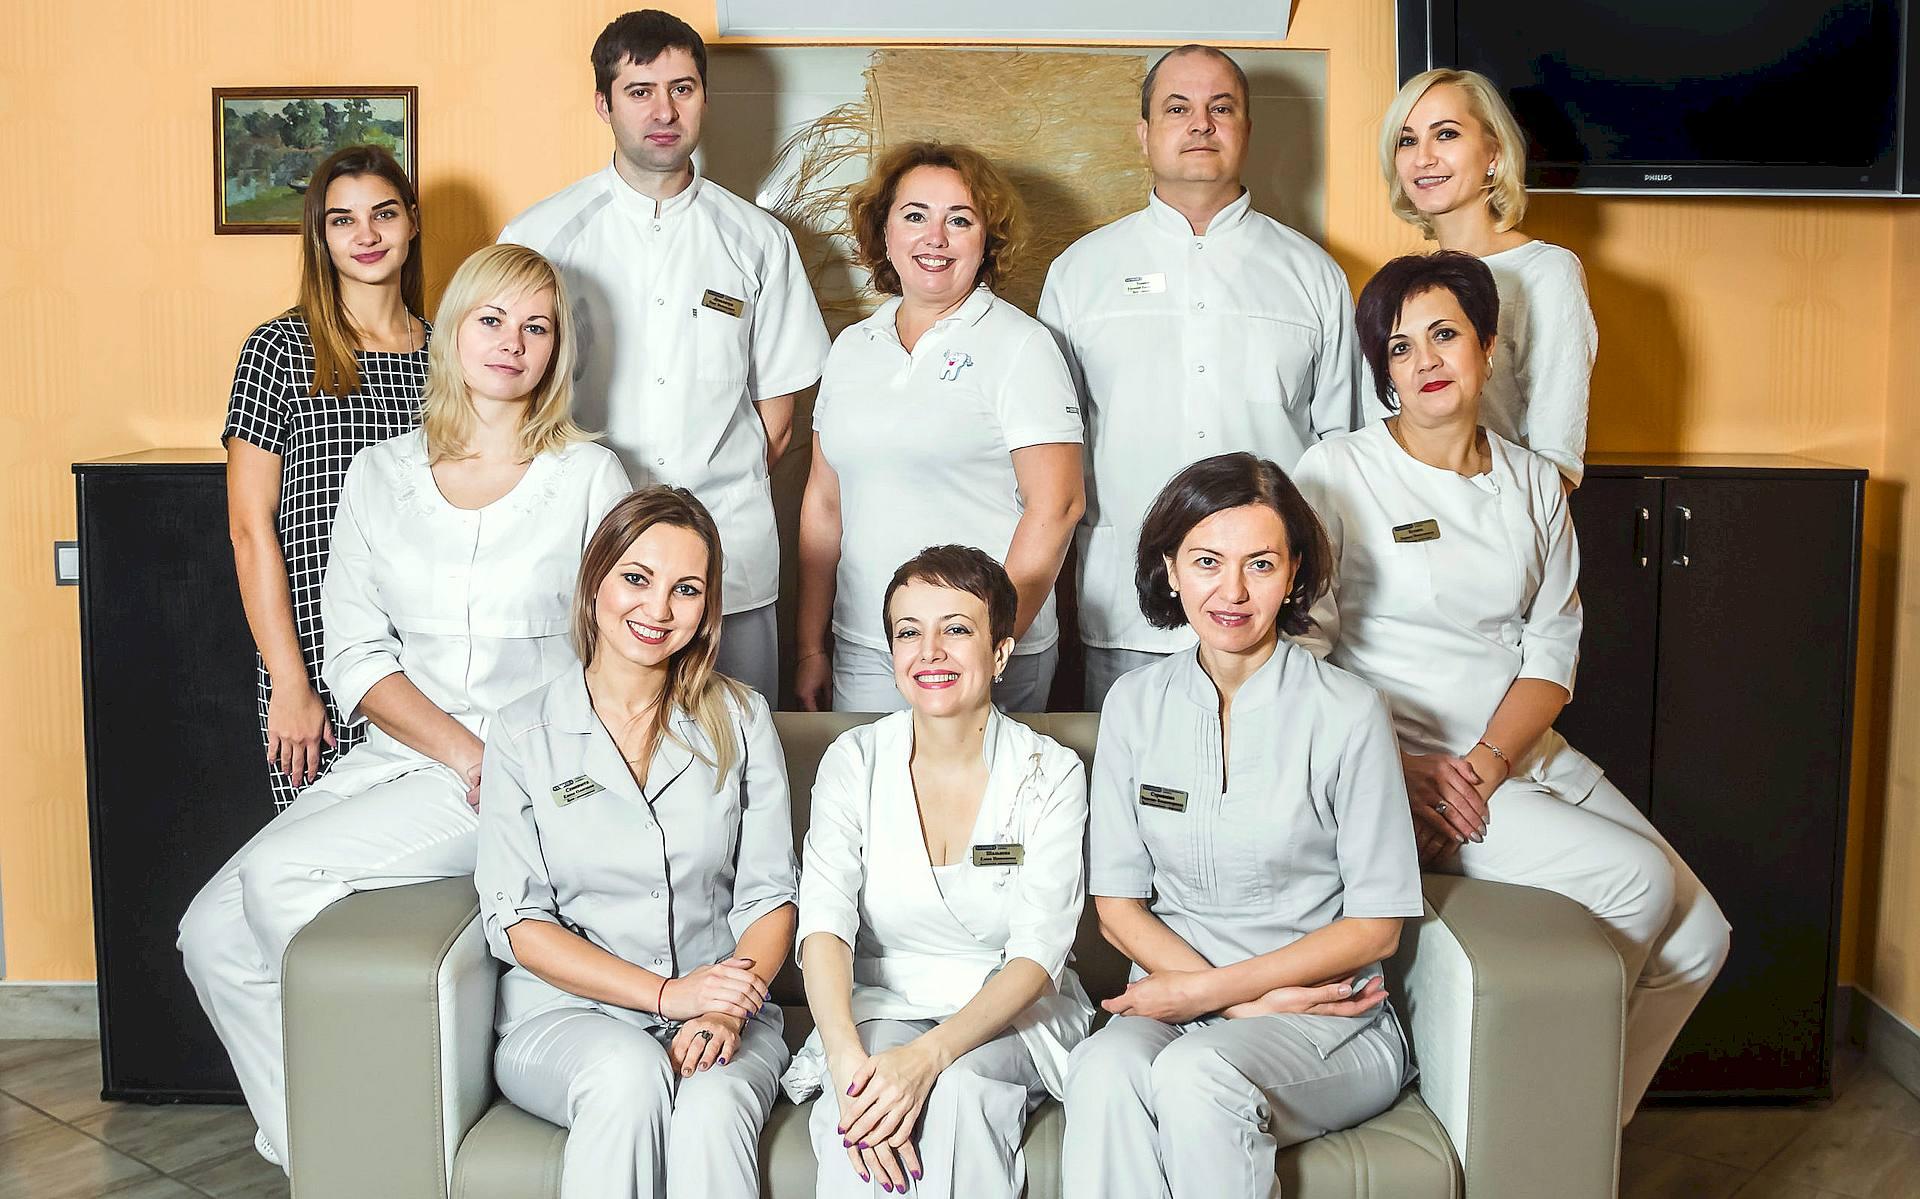 Dentists Sandora